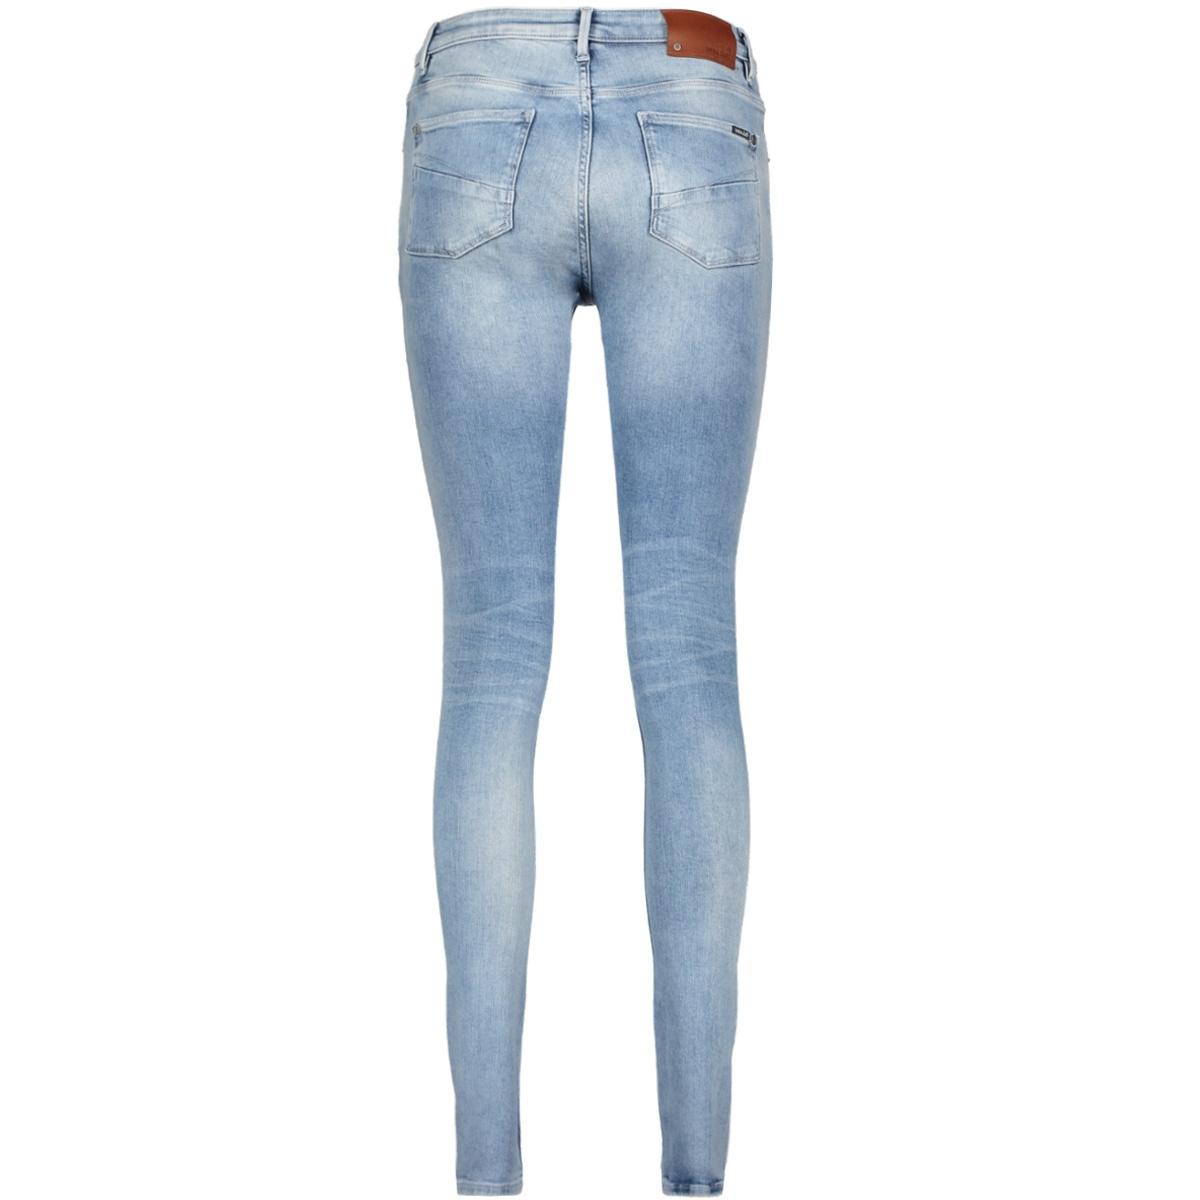 244/30 col.2378_celia garcia jeans 2378 flow denim light used